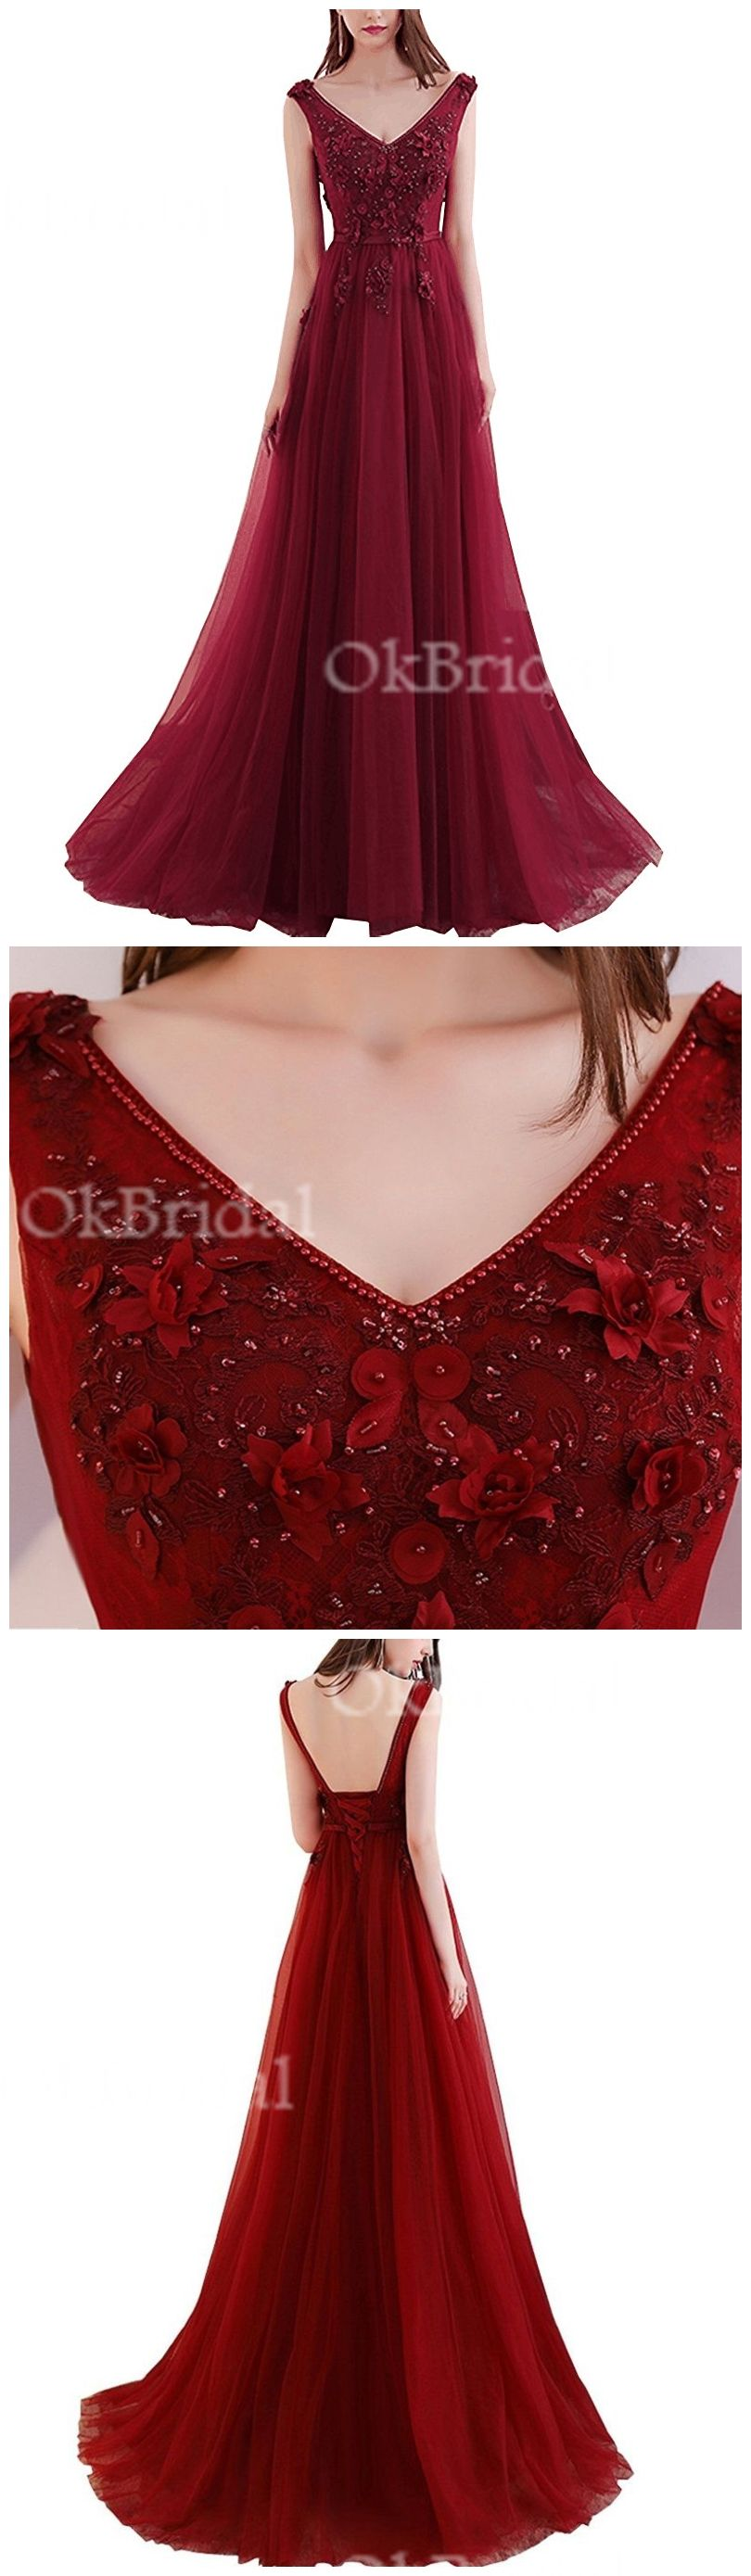 Dark red sexy deep v neckline lace beaded long evening prom dresses